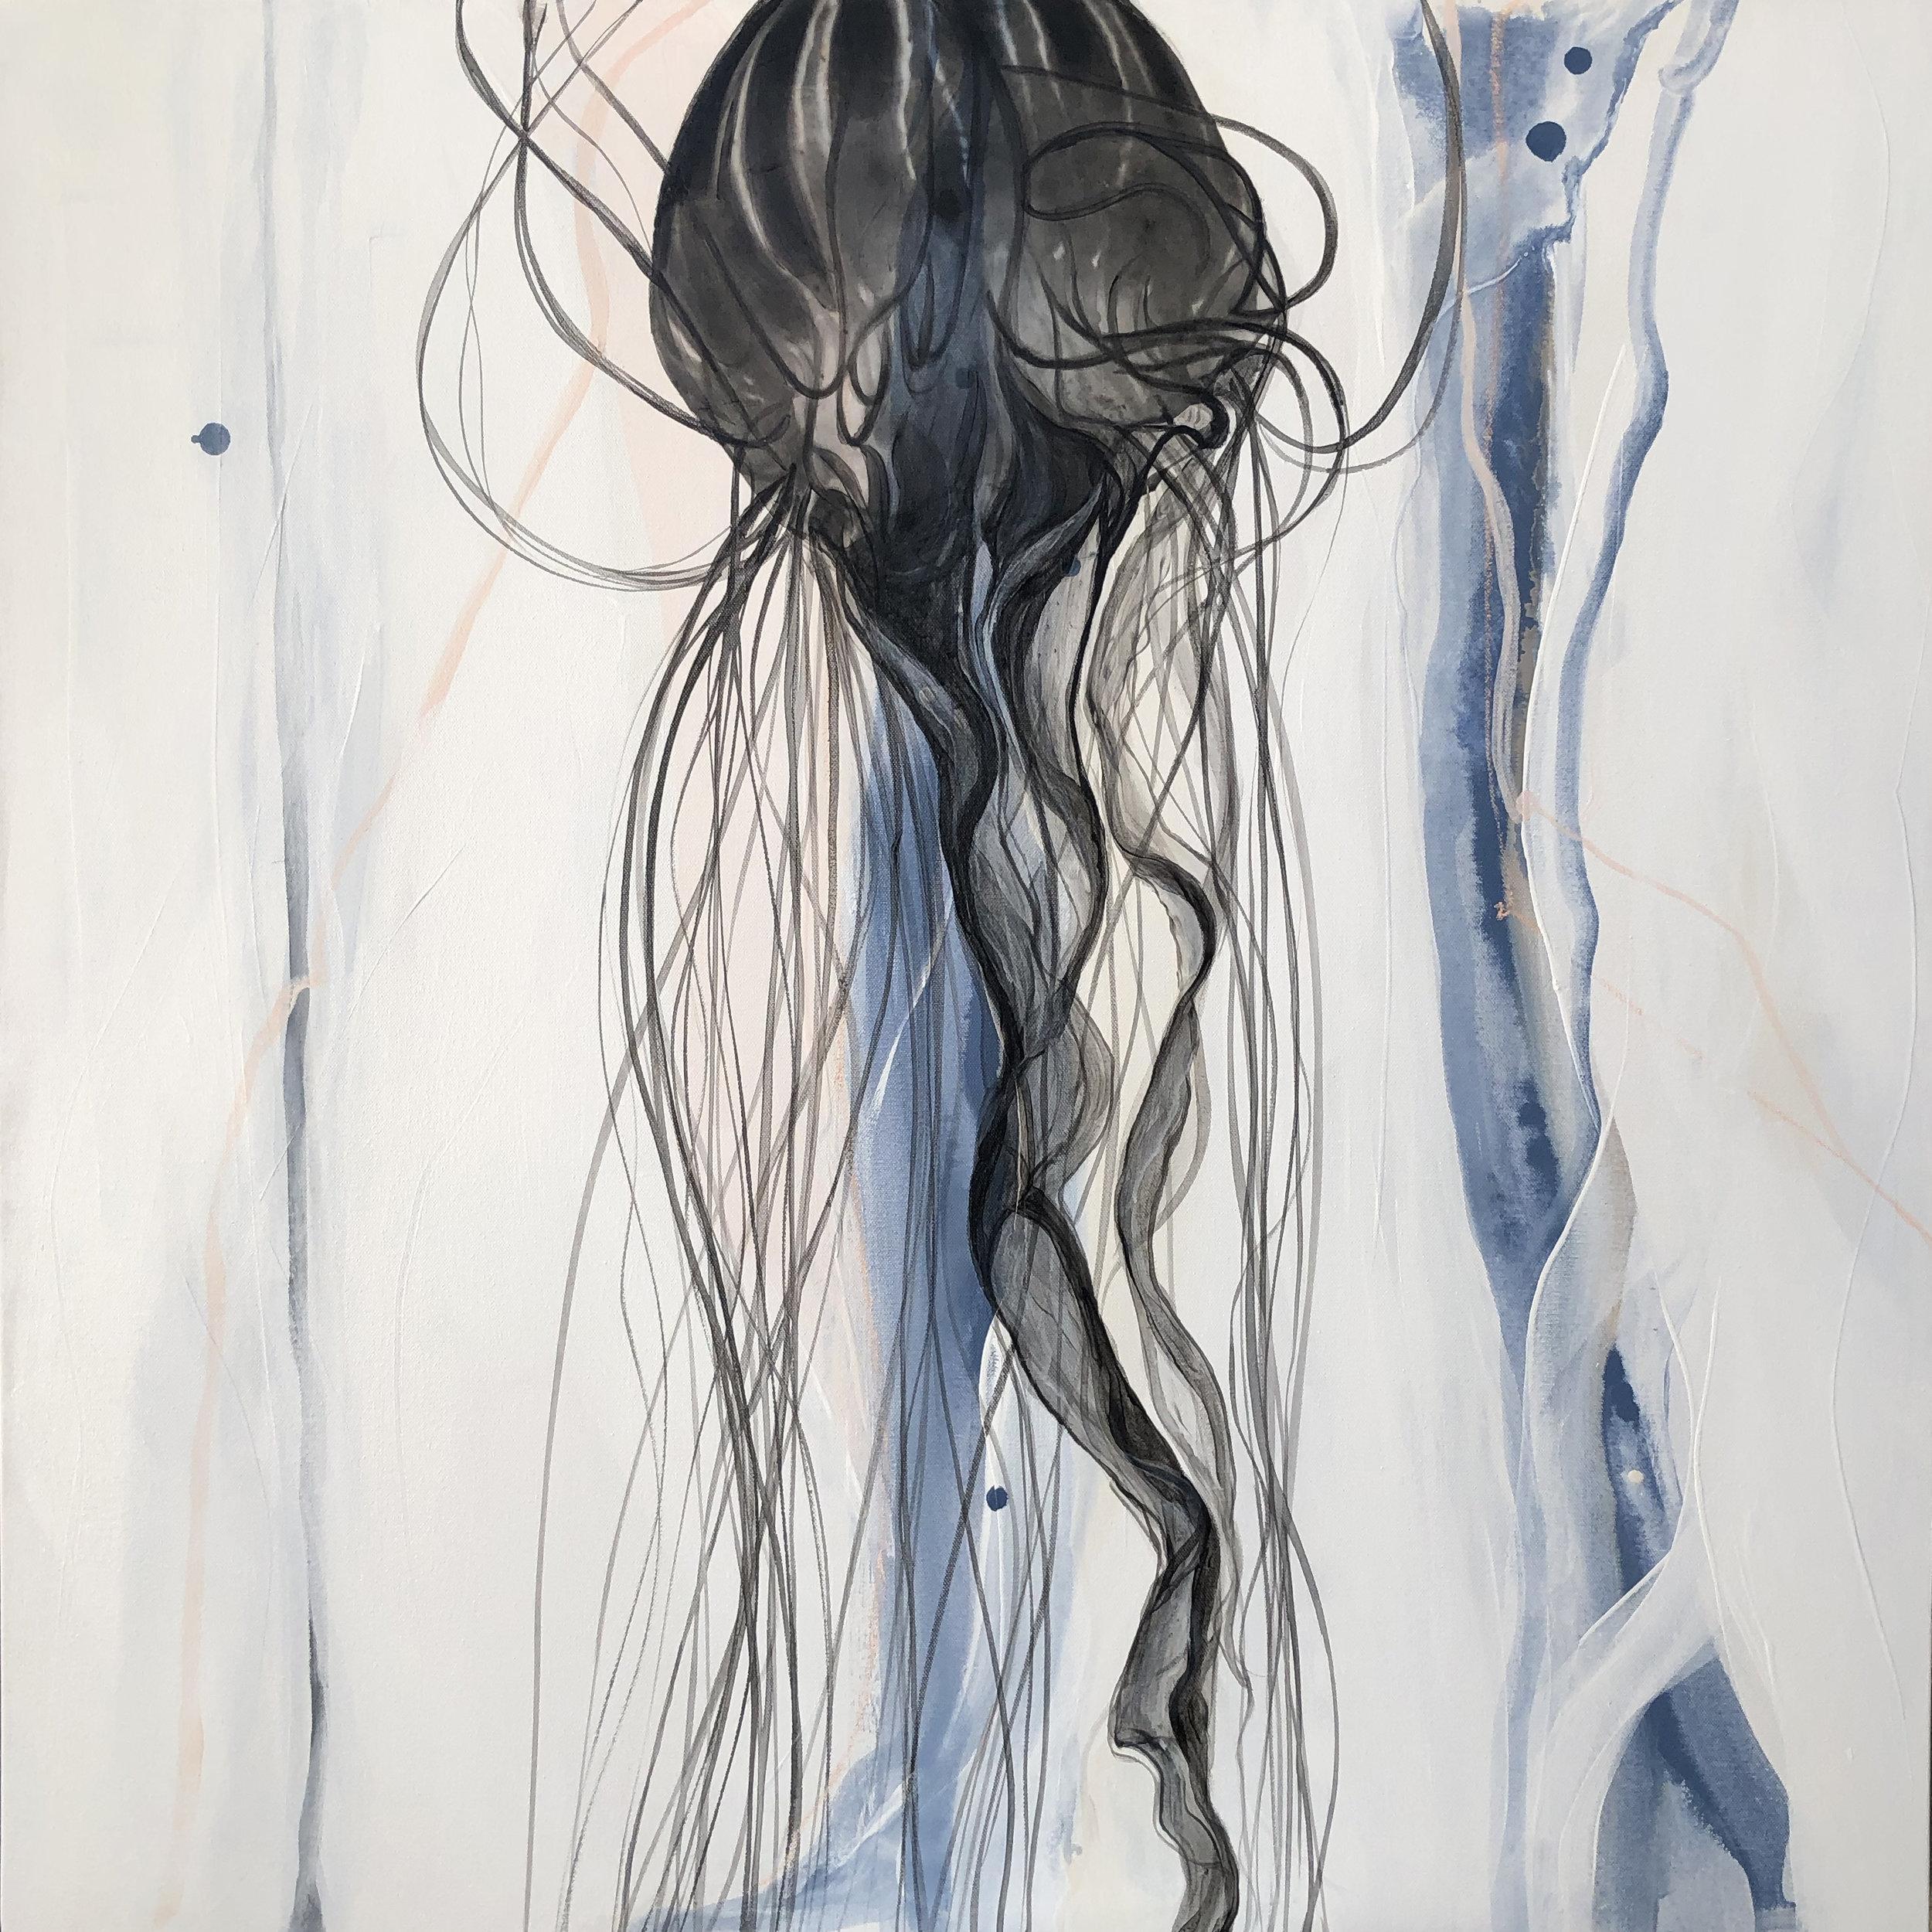 """Medusa""    Mixed Media on Canvas, 36x36x1.5,"" SOLD"